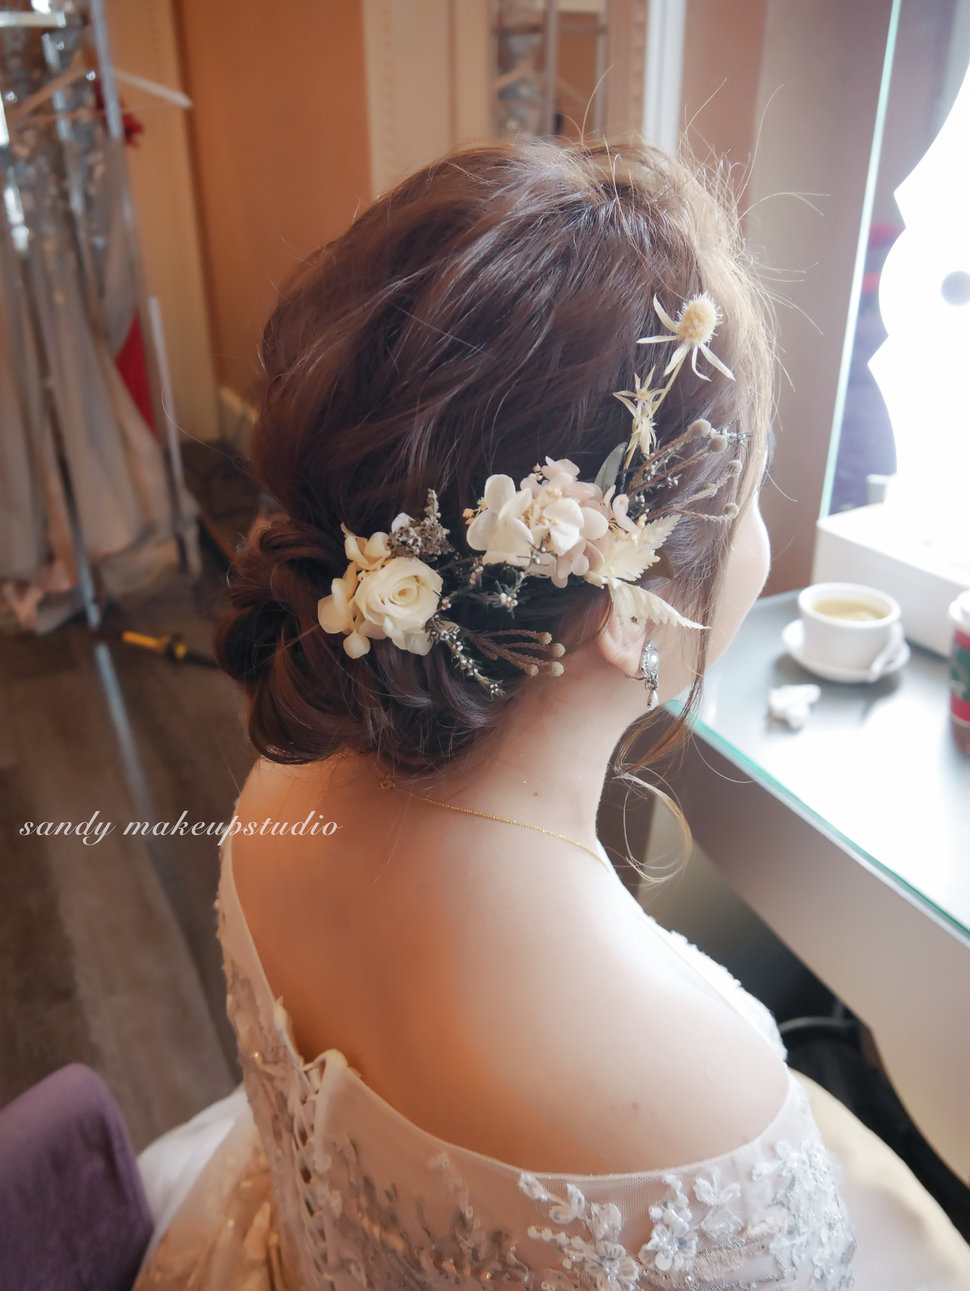 P1120113拷貝 - 基隆台北全省Sandy新娘秘書《結婚吧》